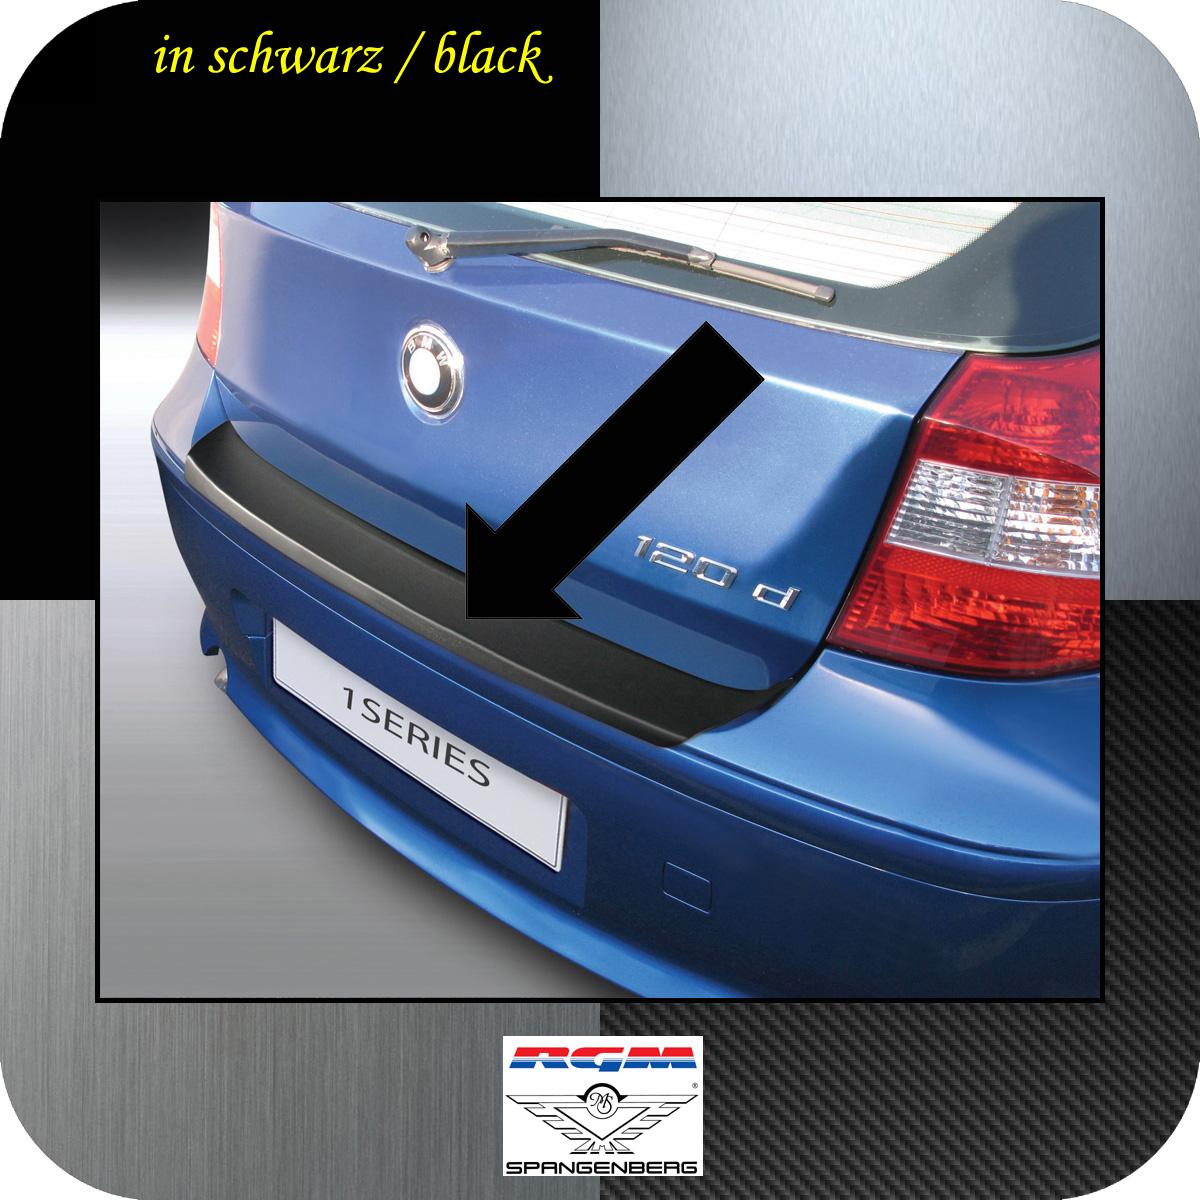 Ladekantenschutz schwarz BMW 1er E81 E87 Schrägheck vor Mopf 2003-07 3500441